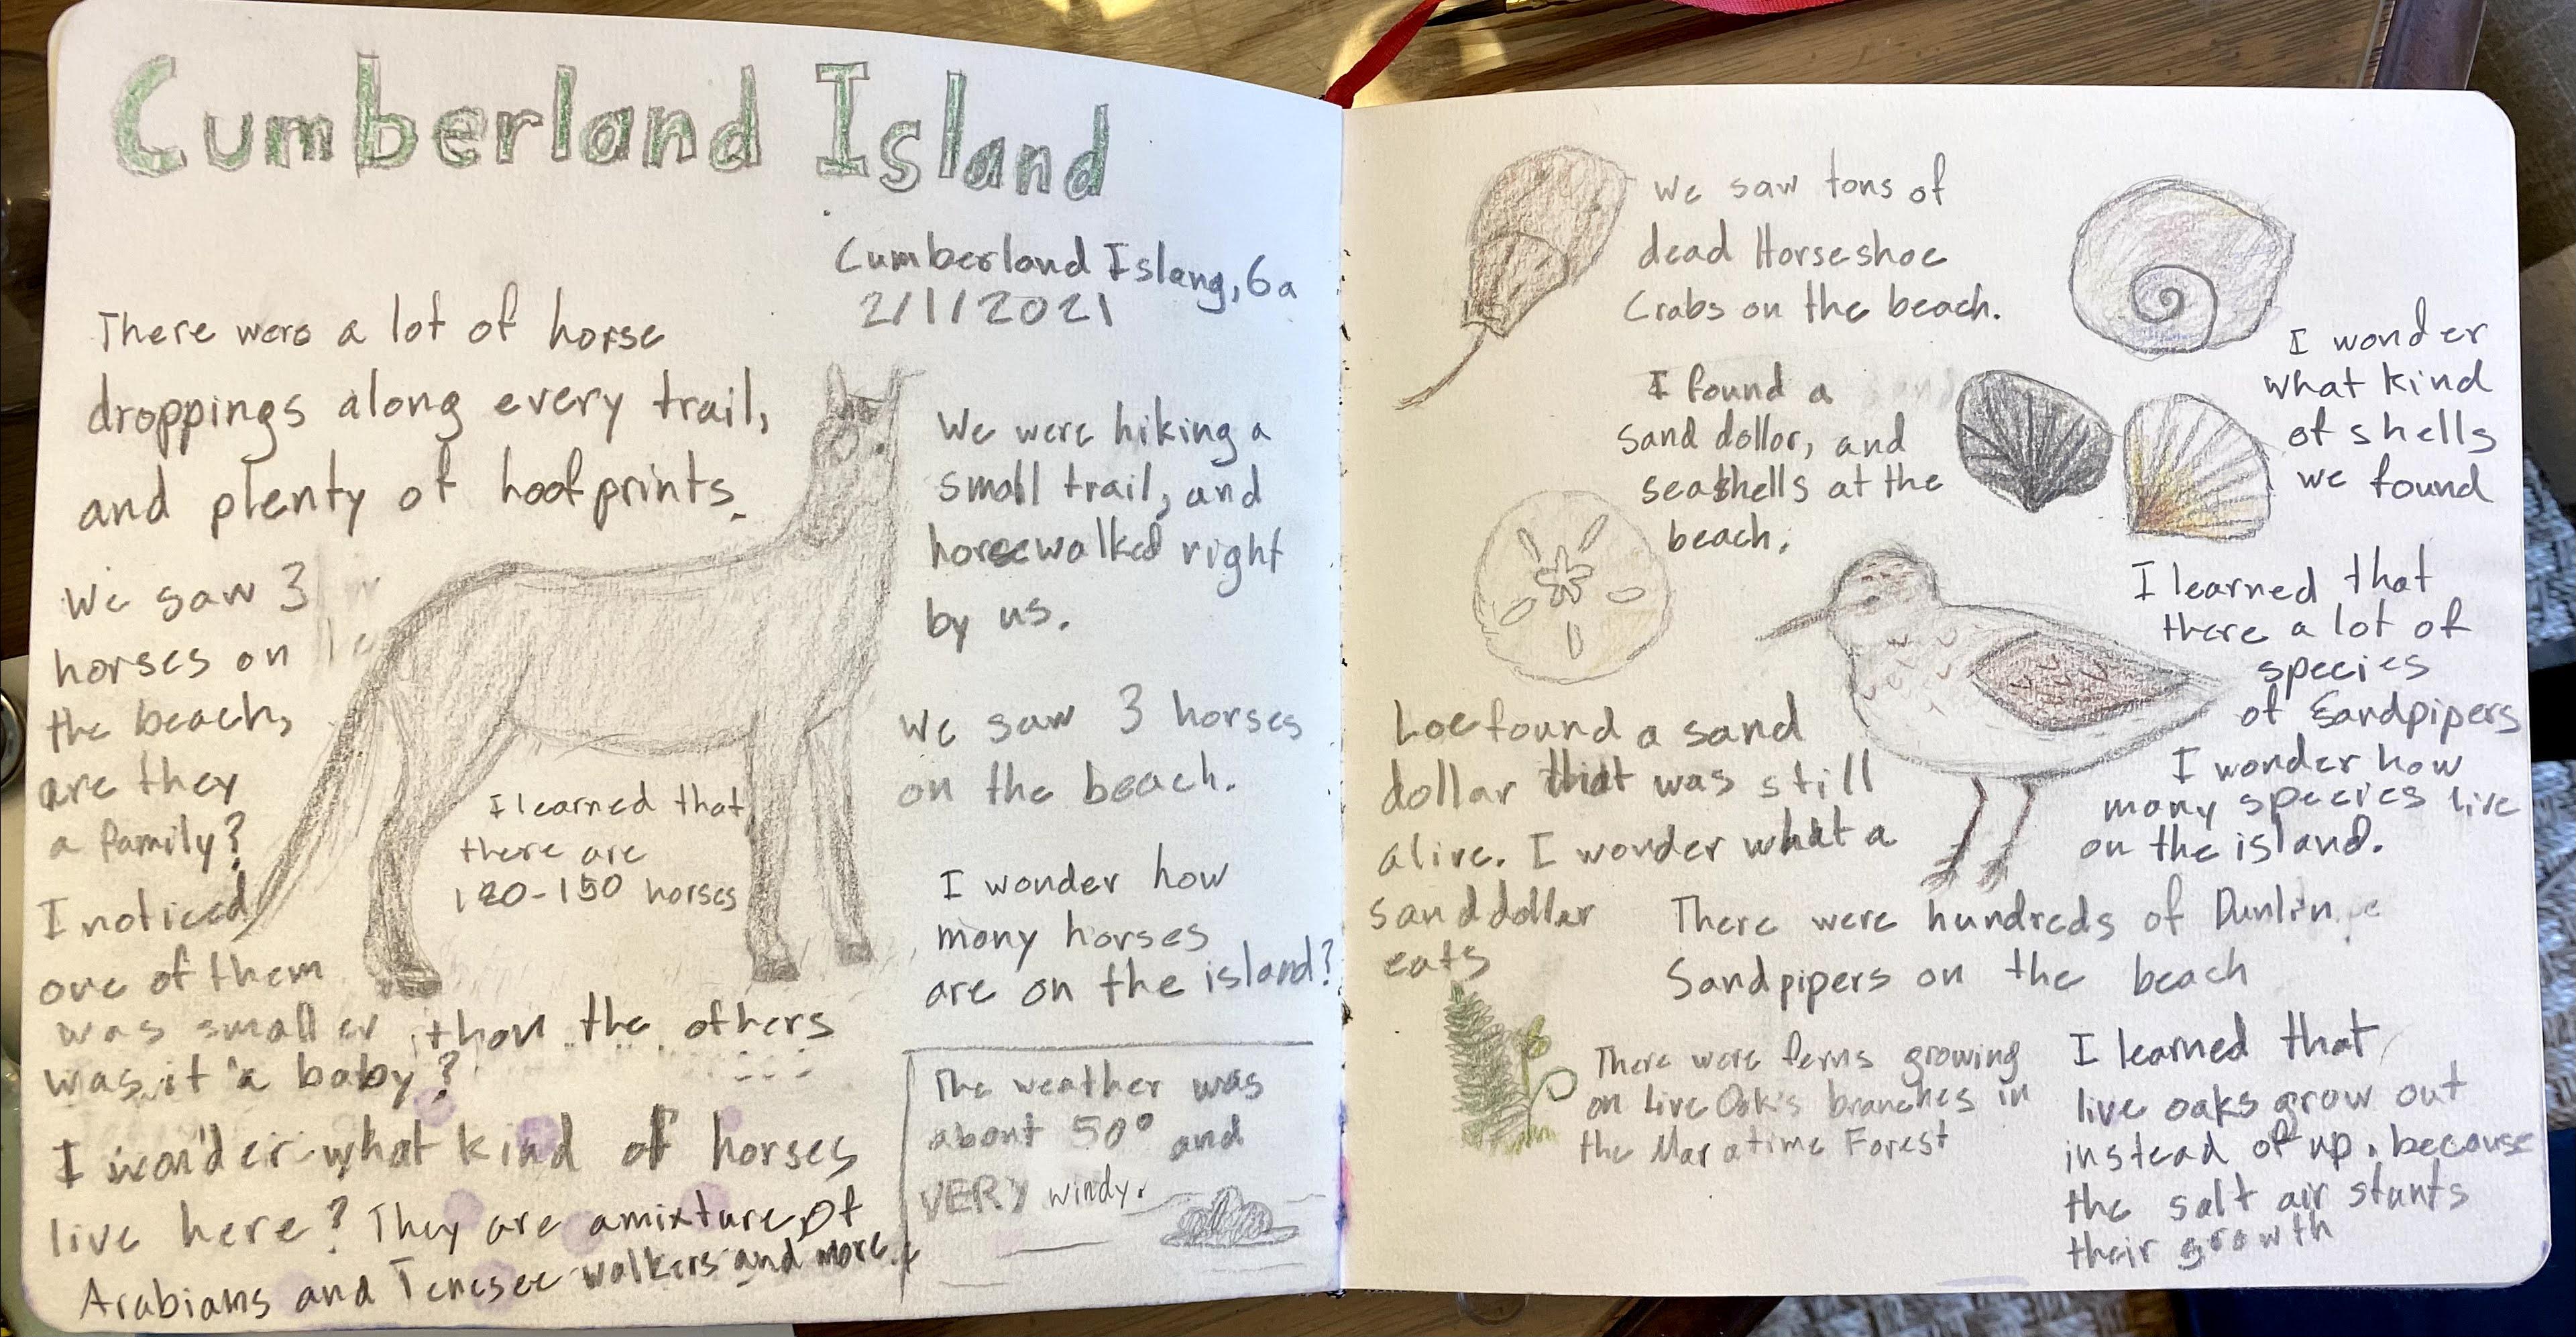 Aud's Cumberland Island NJ